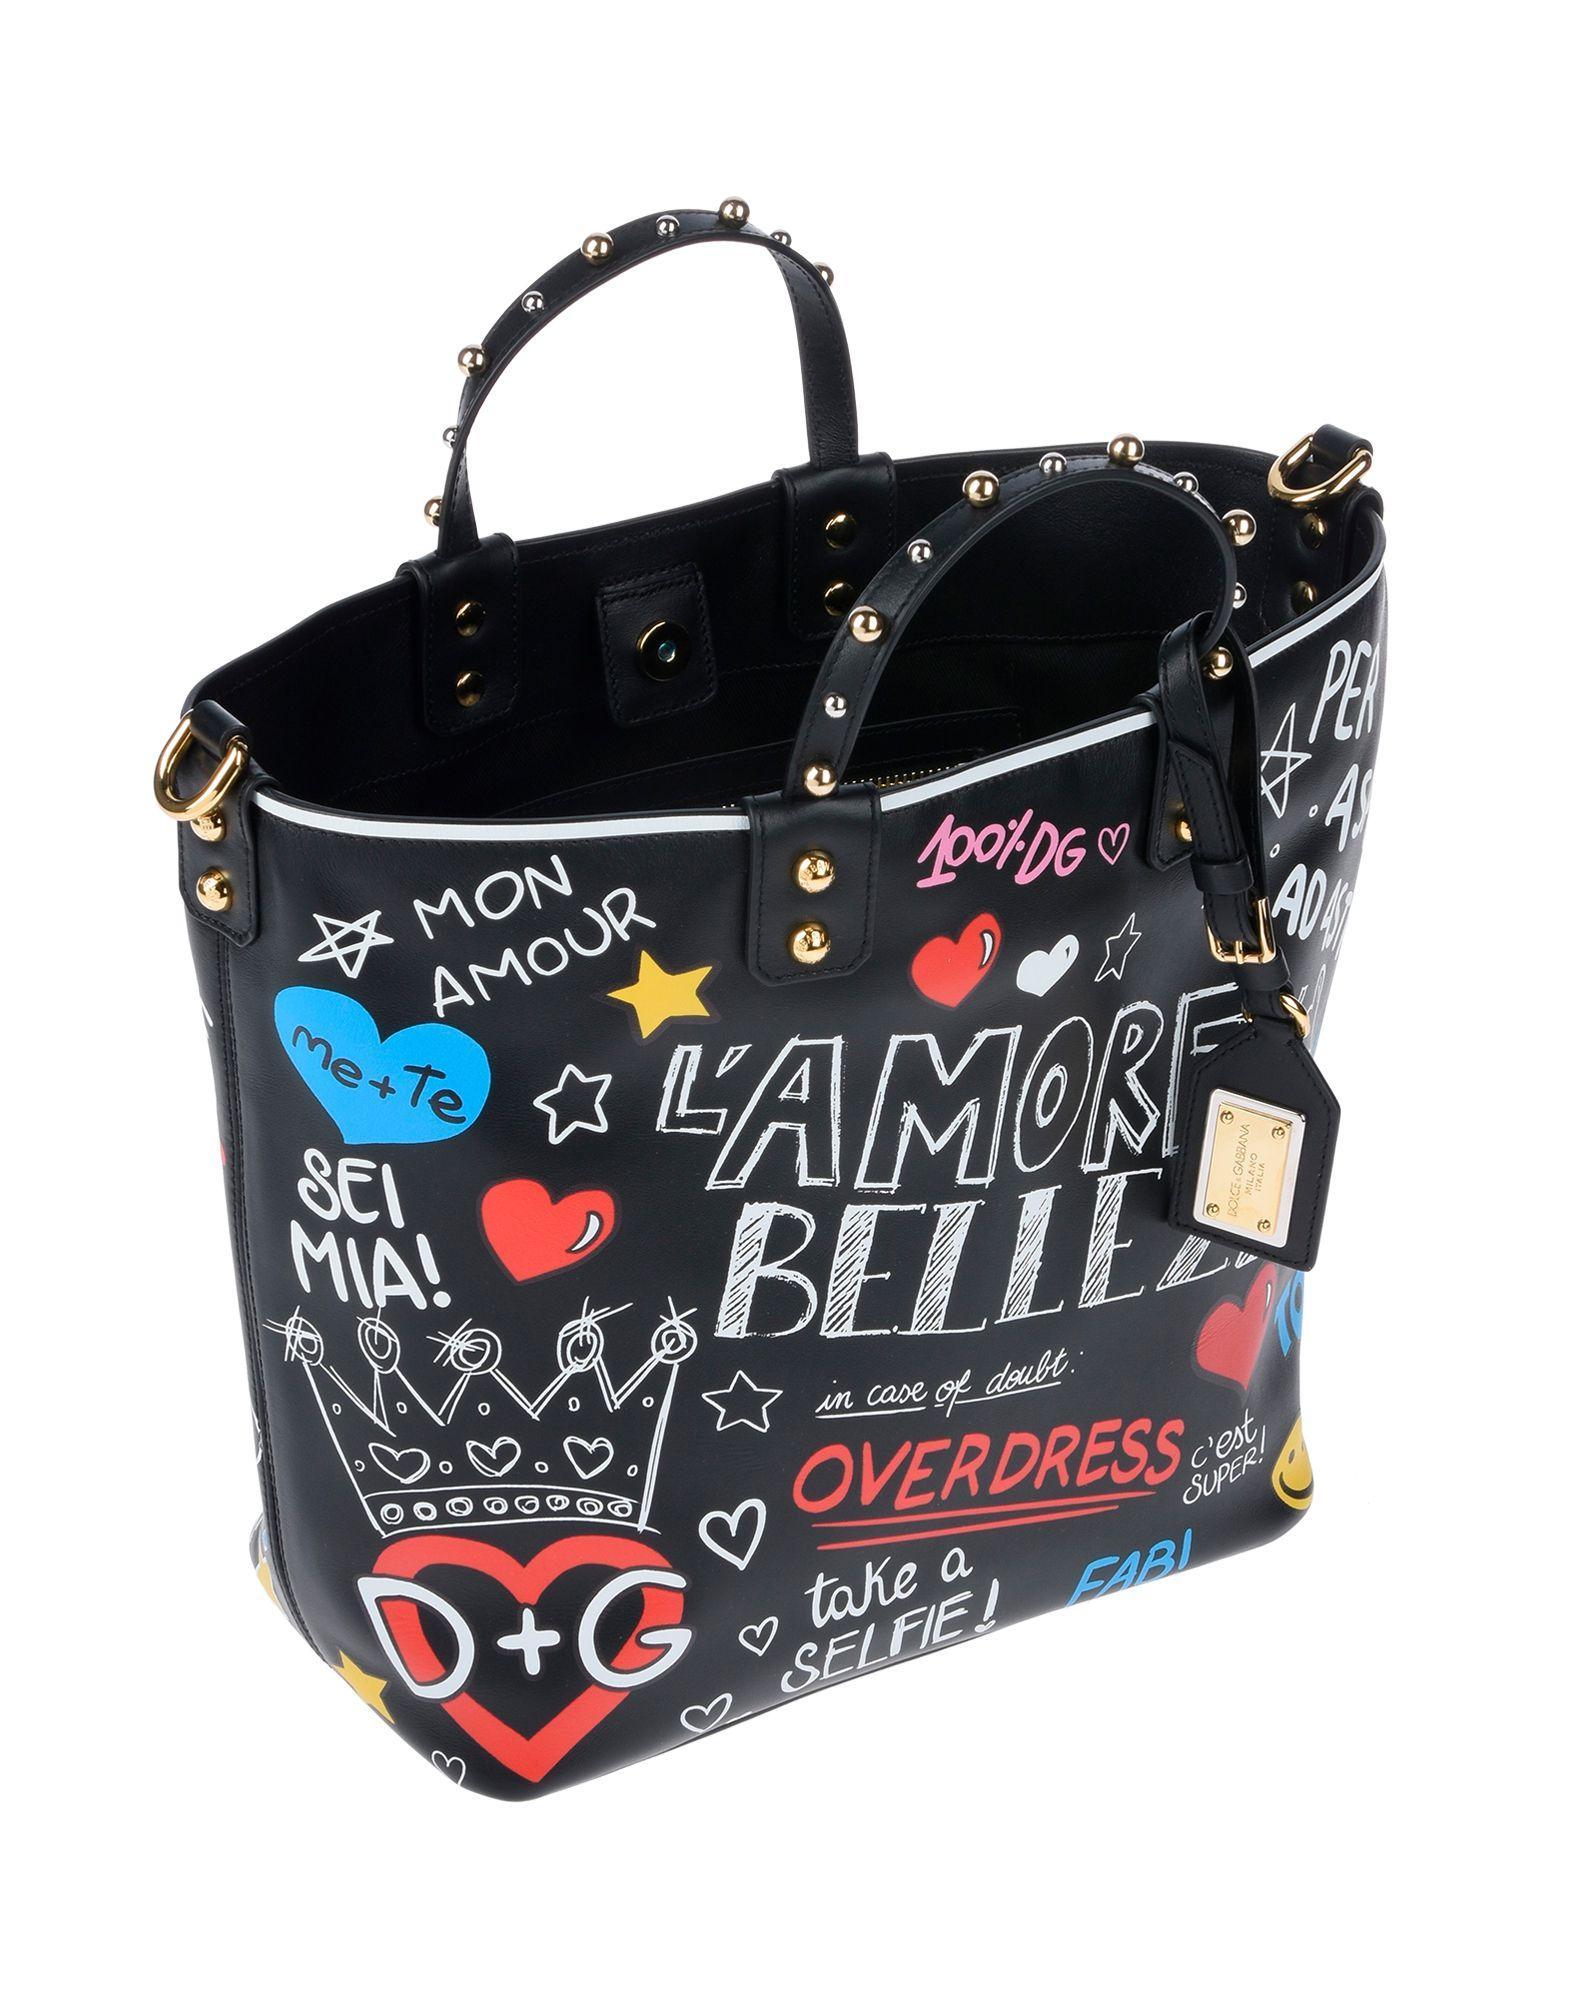 a85e8d0962d0 Dolce   Gabbana Handbag in Black - Save 46% - Lyst